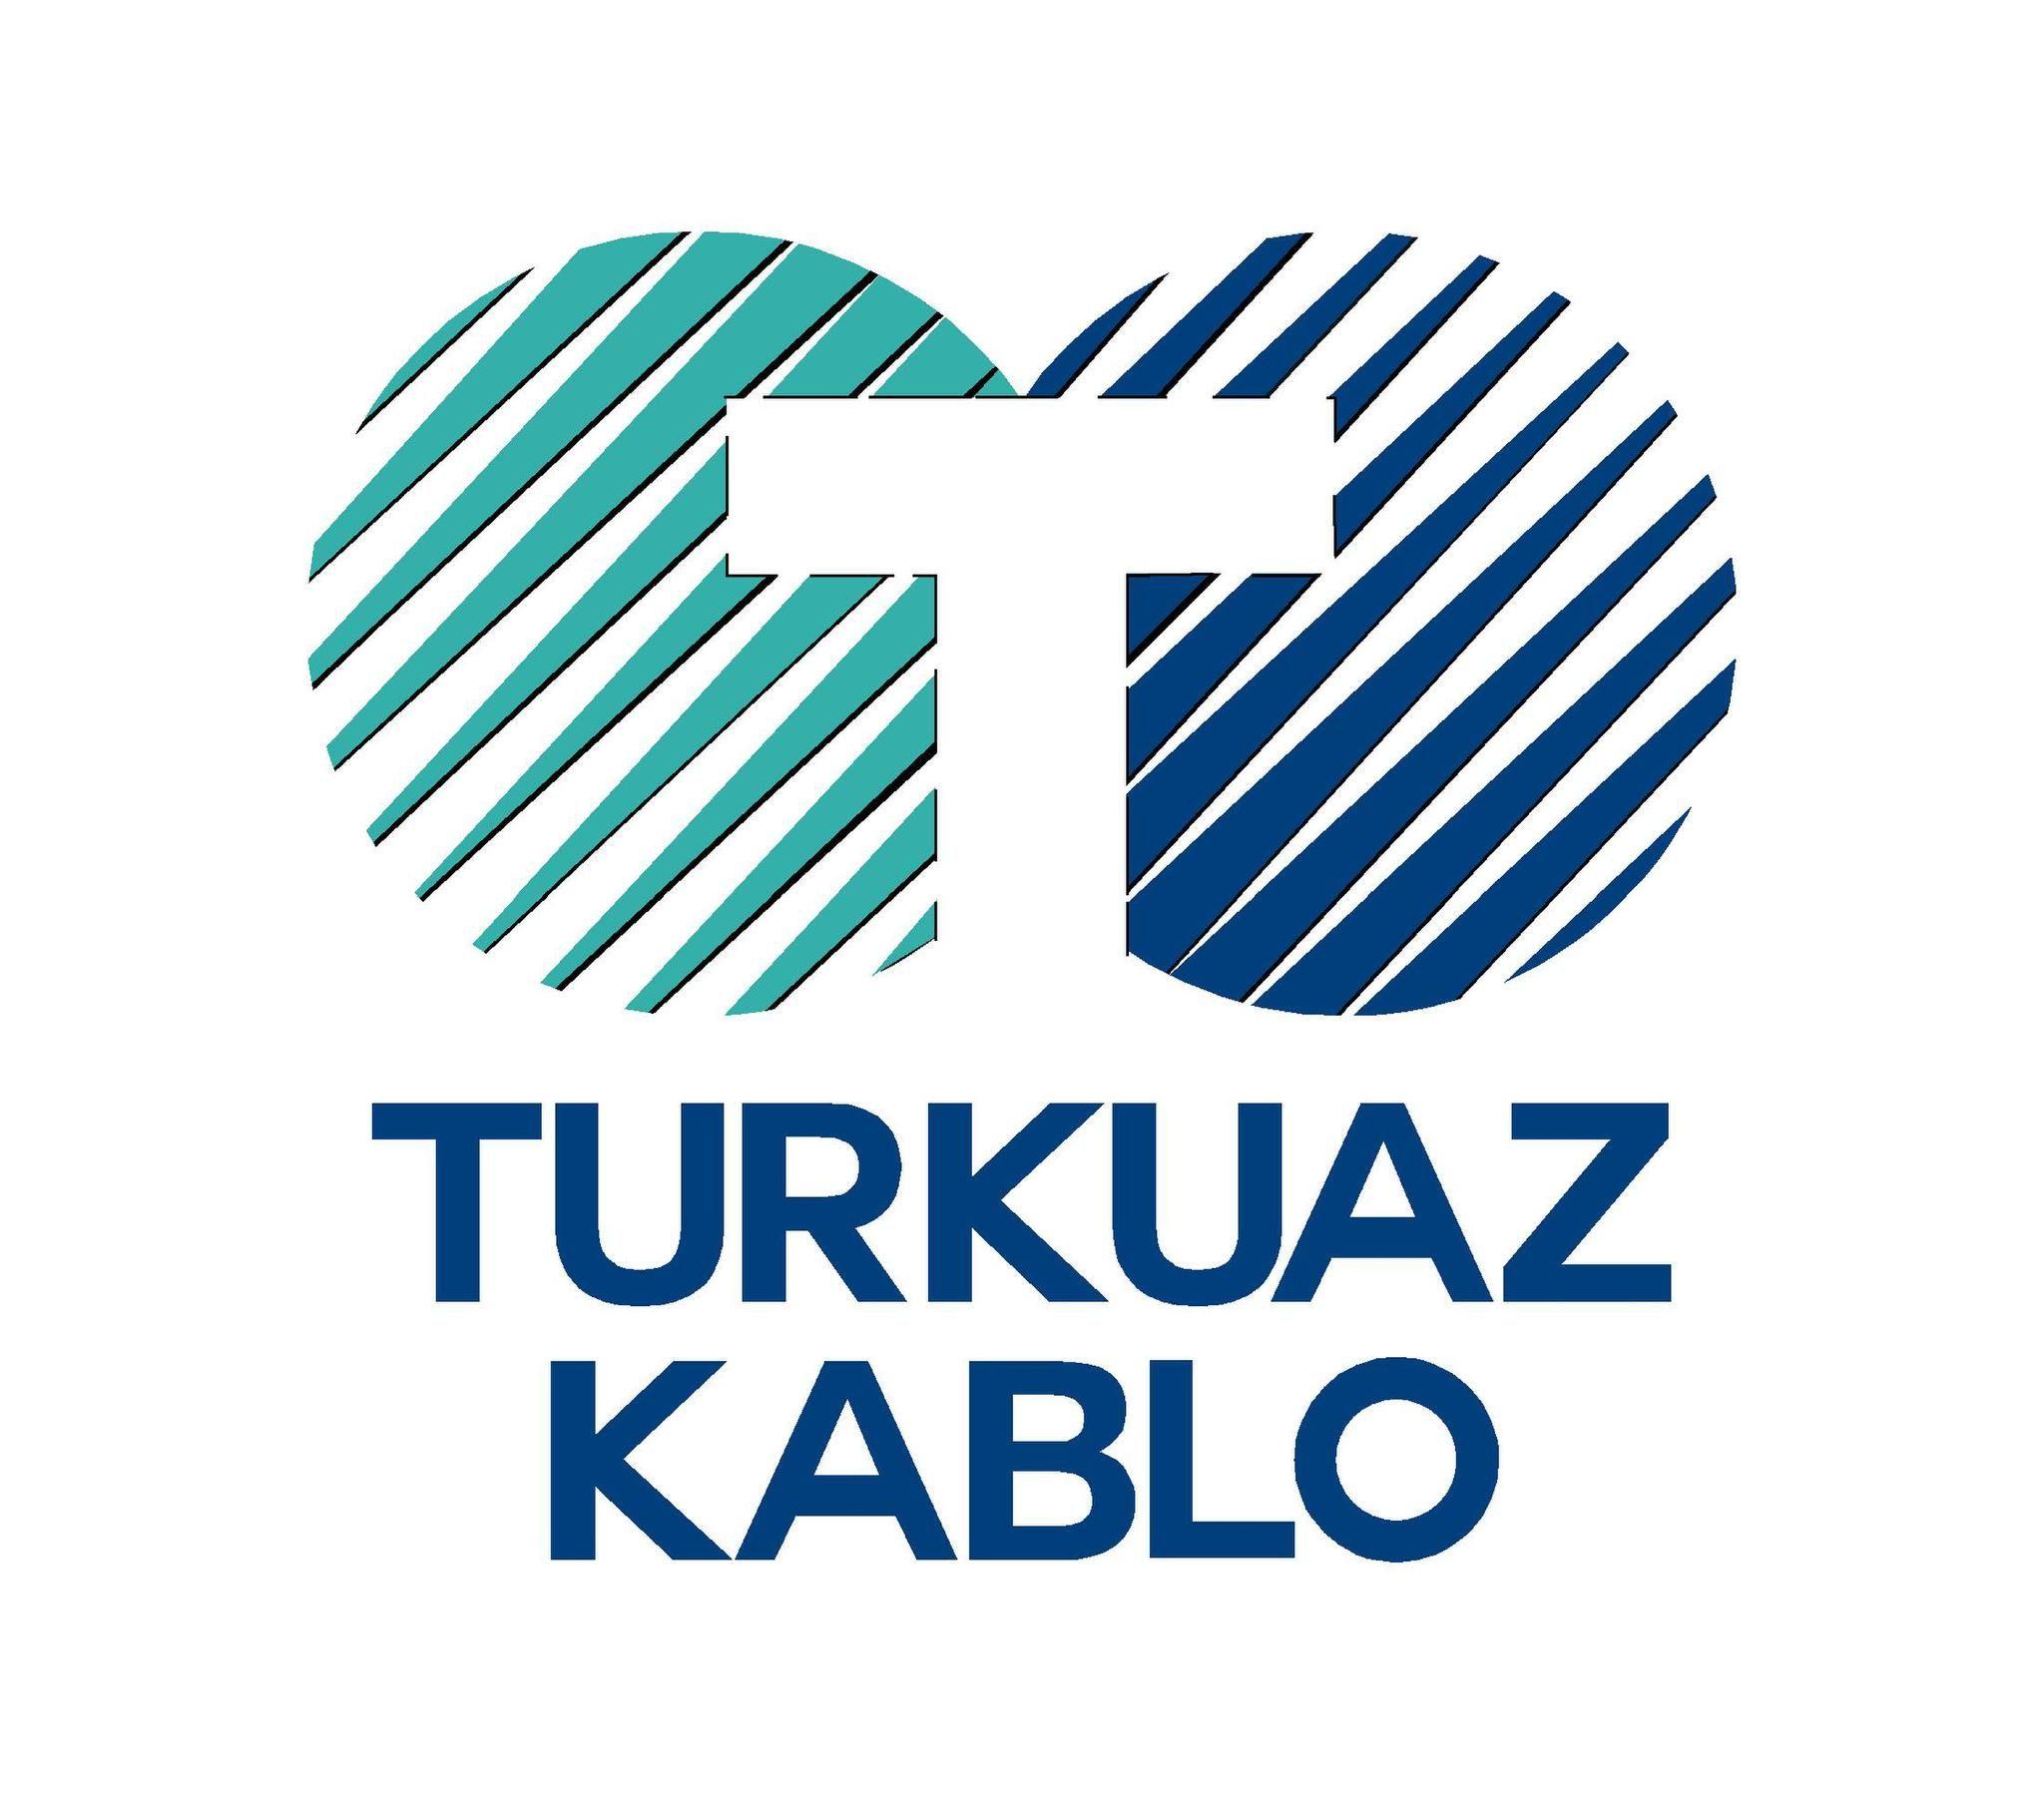 Turkuaz Kablo Taahhut Ticaret Ve Sanayi A.S.